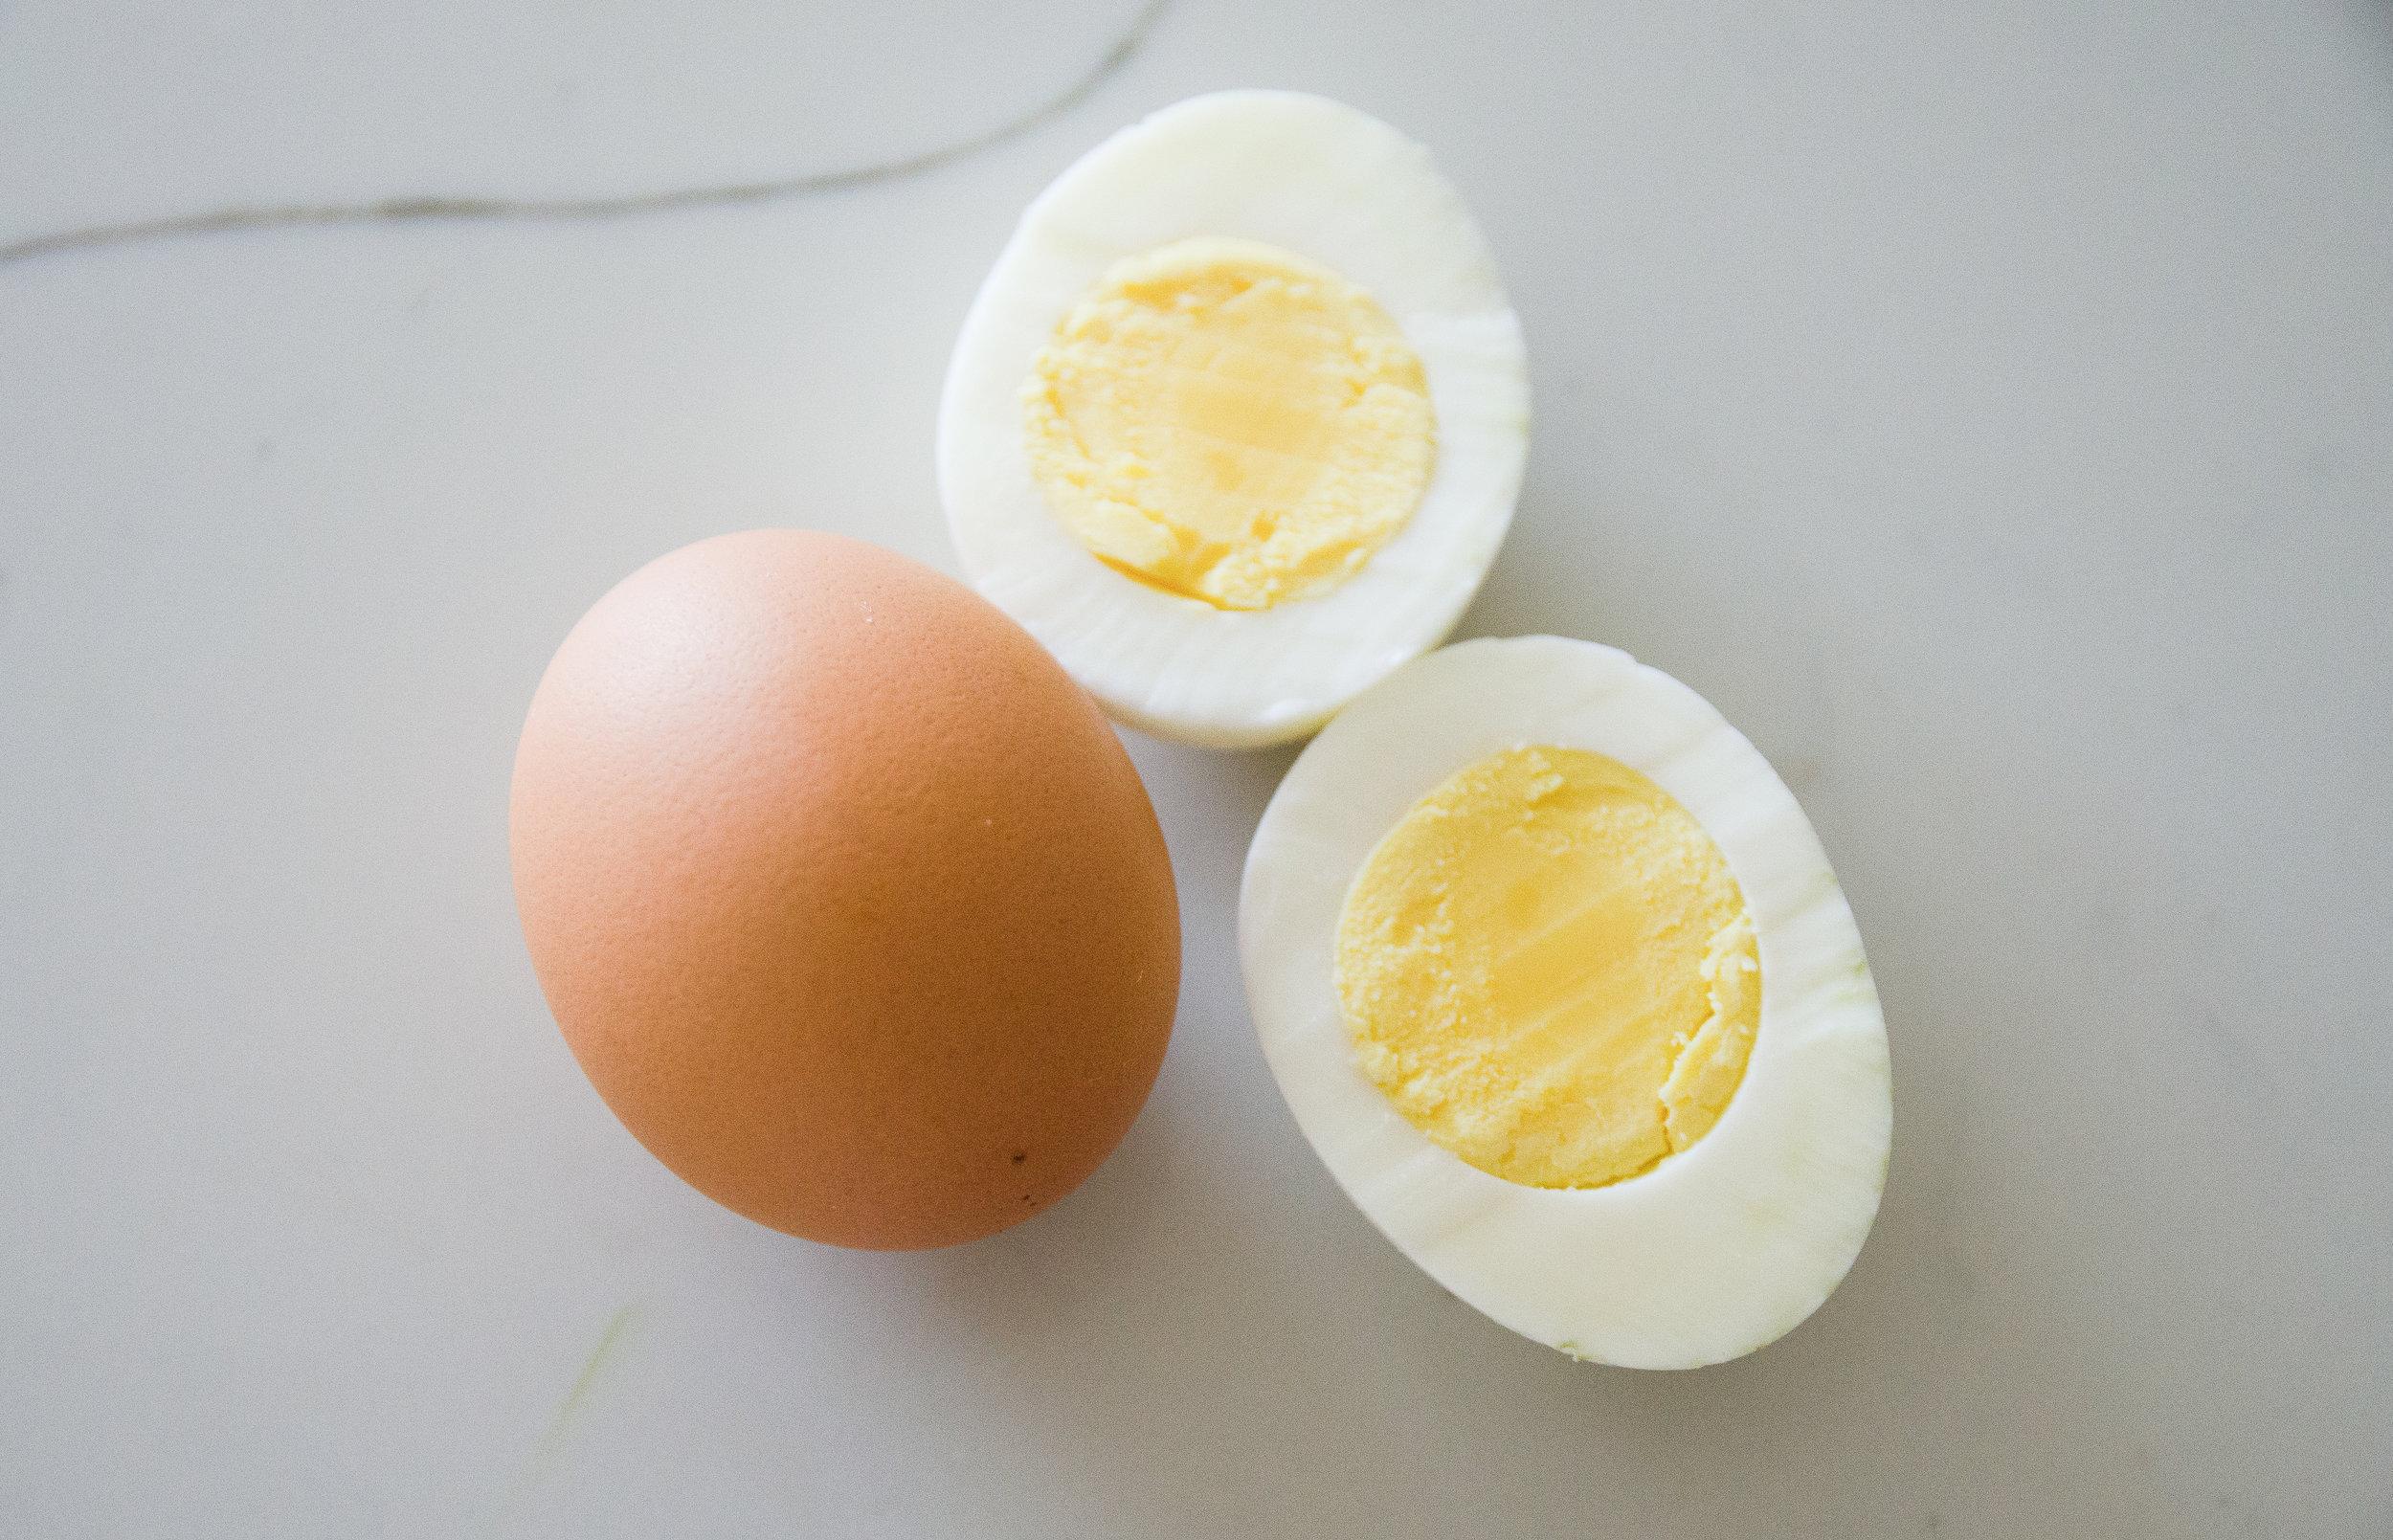 eggs_source_fats.jpg